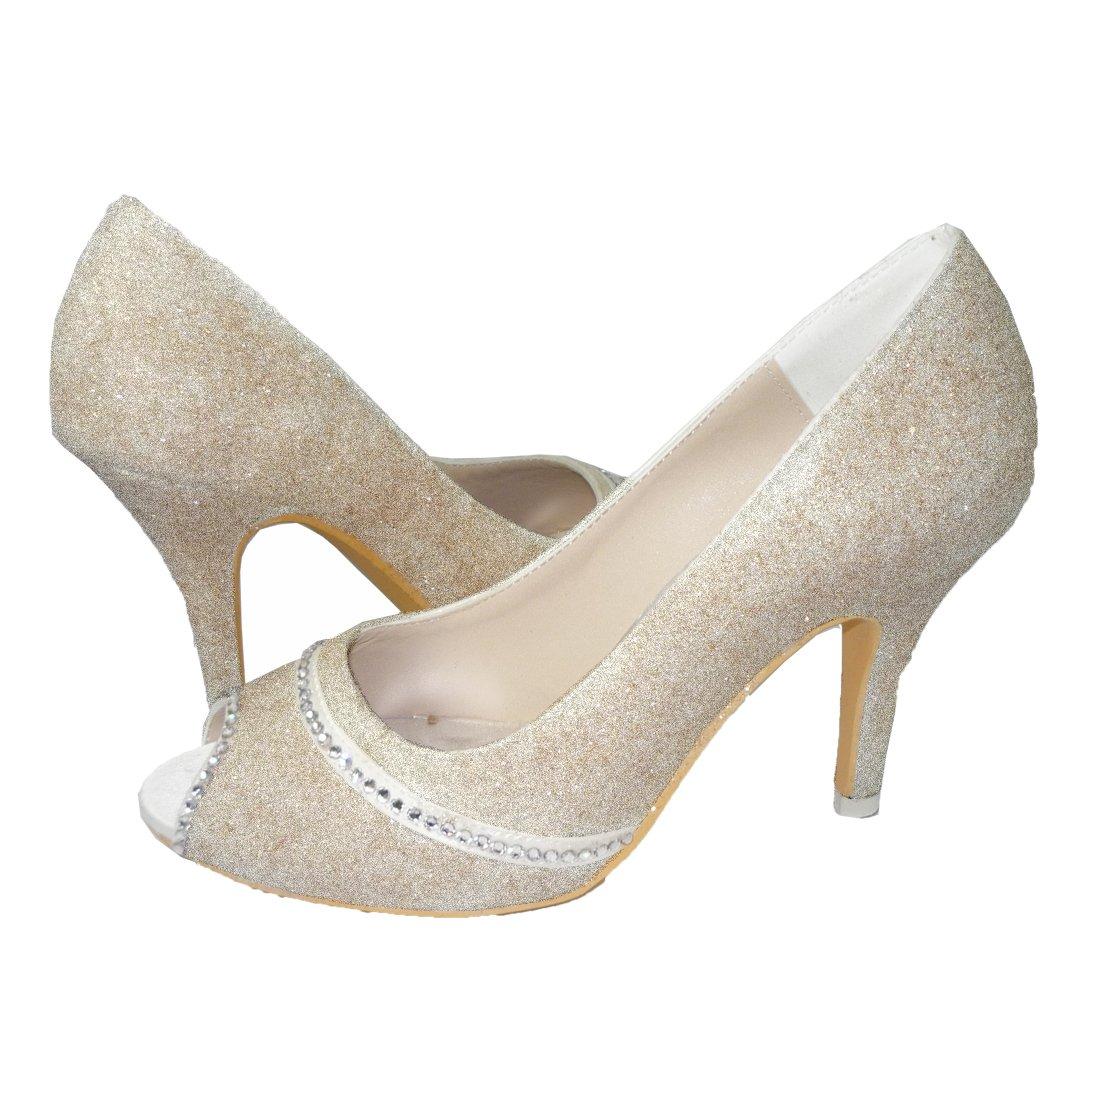 8119e9361684 Amazon.com  Champagne Glitter Heels with Crystal Swarovski Rhinestones